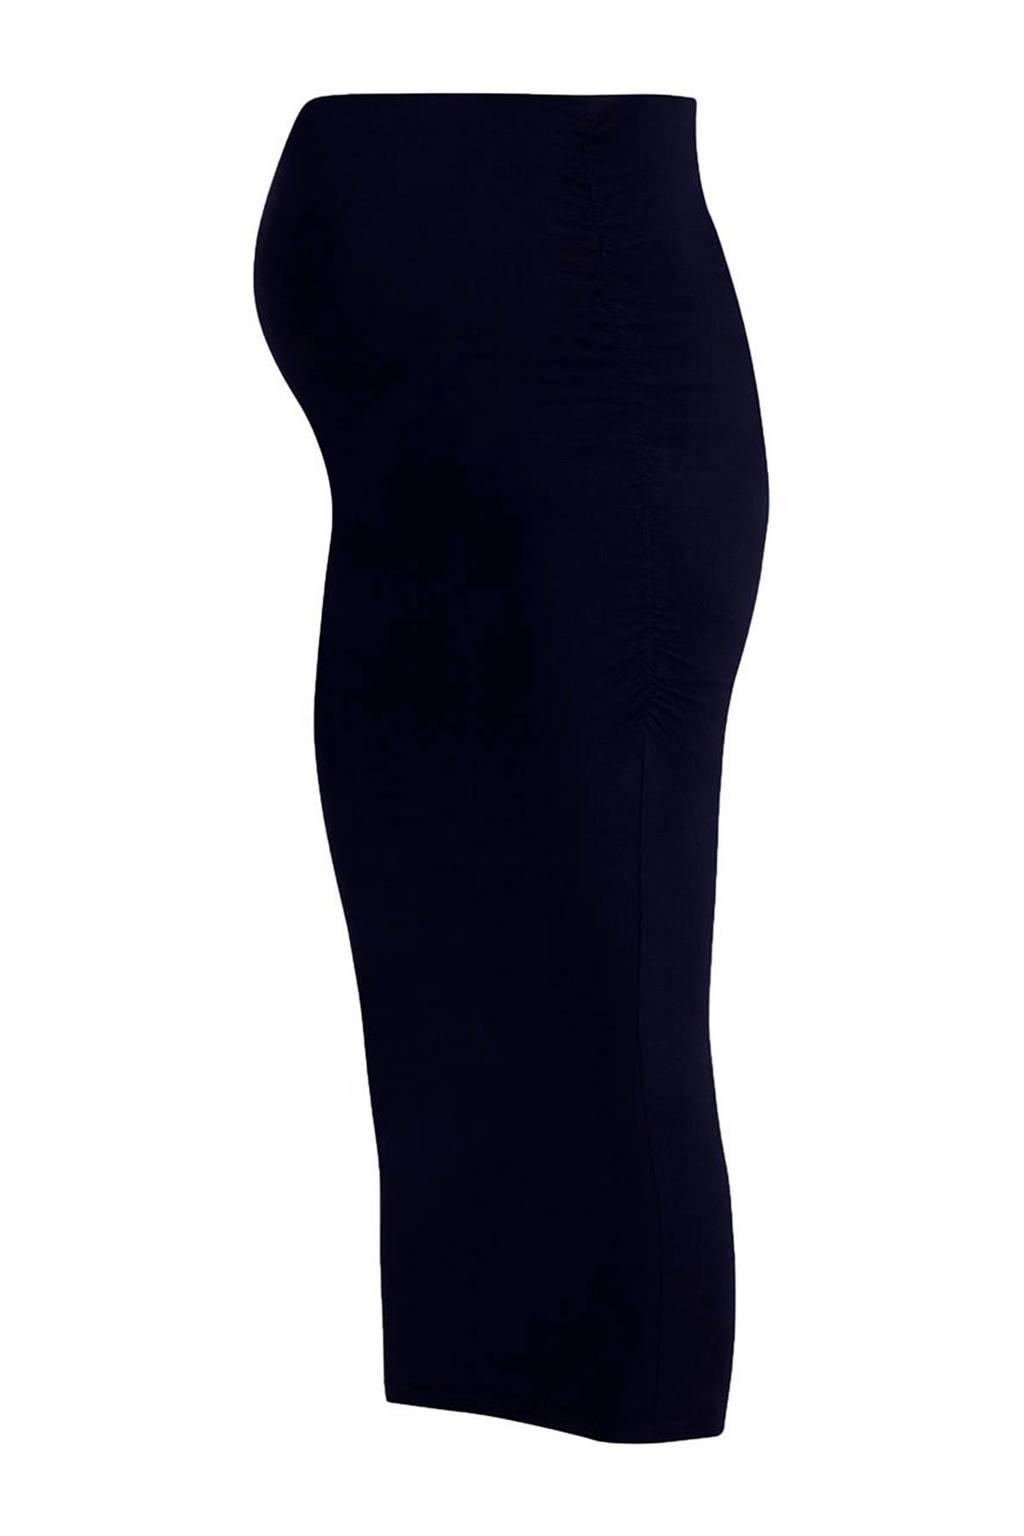 Noppies zwangerschapsrok donkerblauw, Donkerblauw